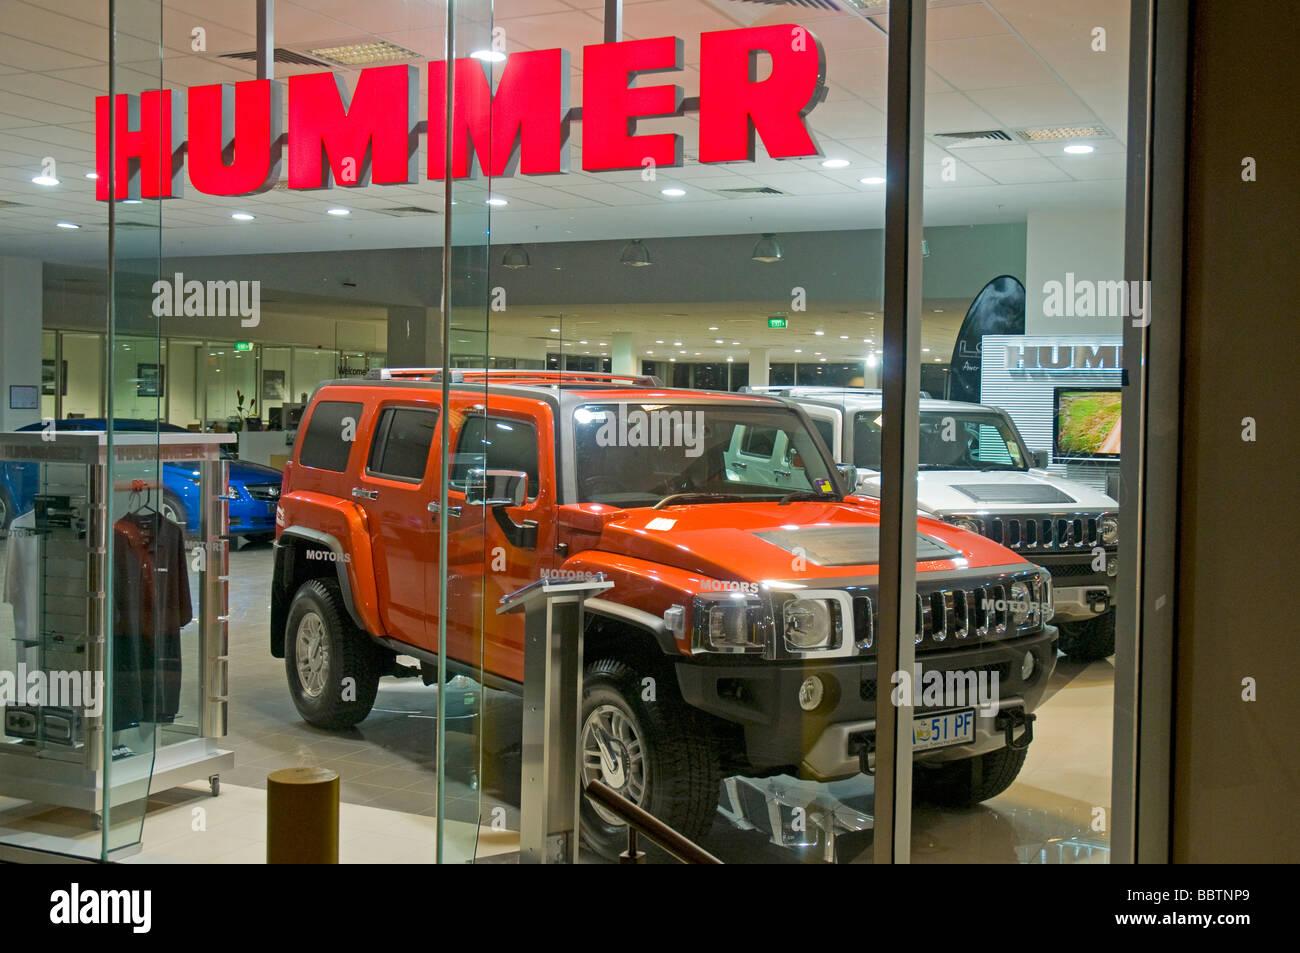 Red civilian model Hummer in showroom - Stock Image